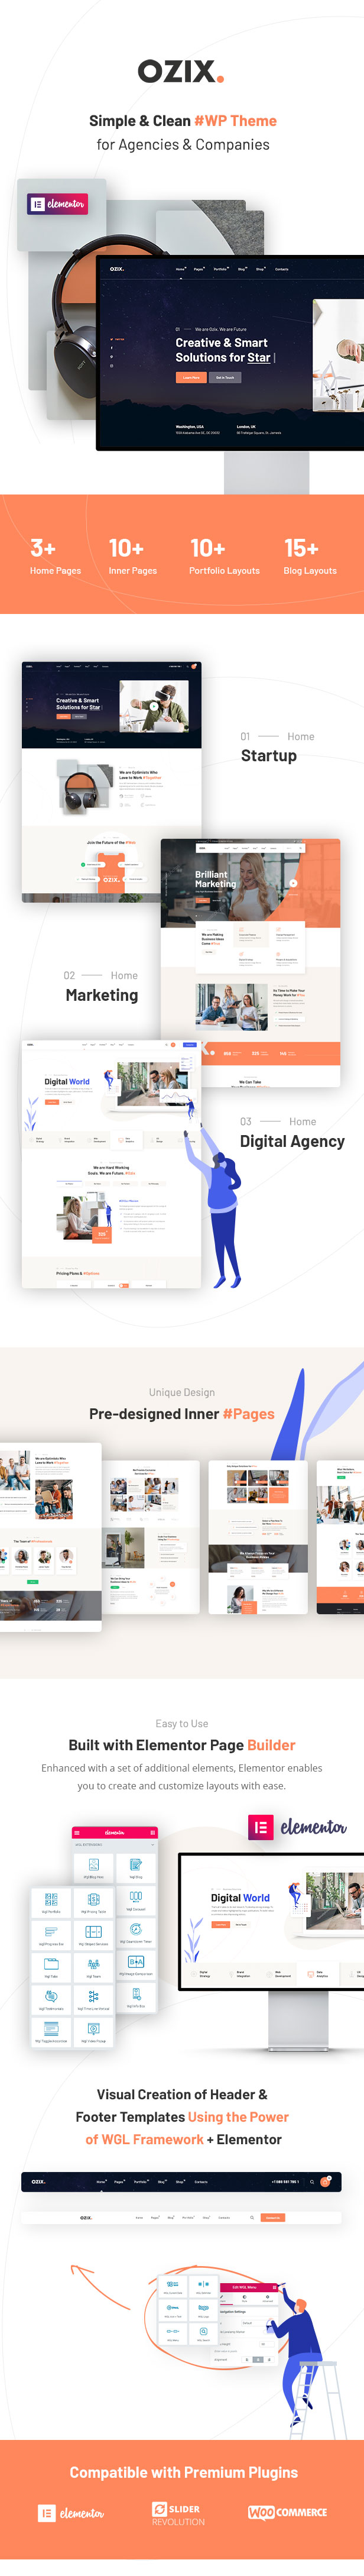 Ozix - Agencies and Companies WordPress Theme - 1